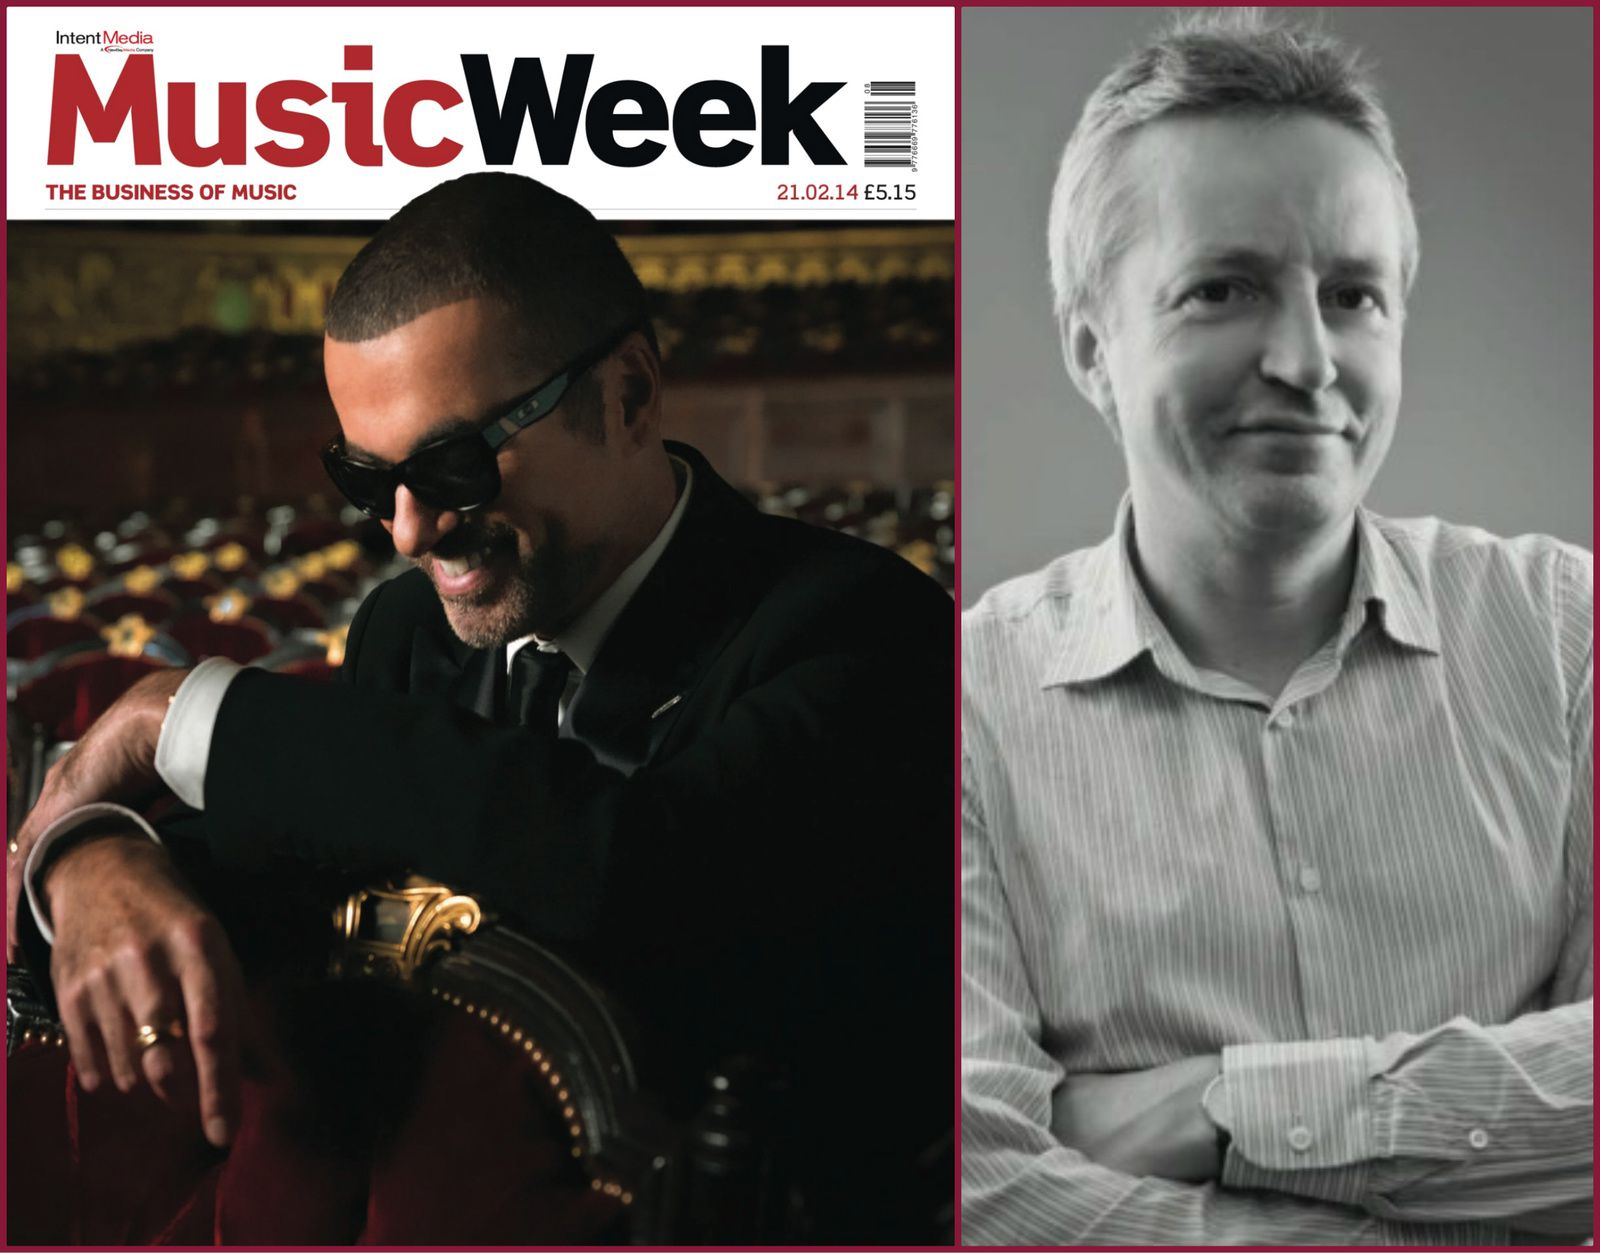 MUSIC WEEK - LE DIRECTEUR GENERAL DE WARNER/CHAPELL PARLE DE GEORGE MICHAEL -